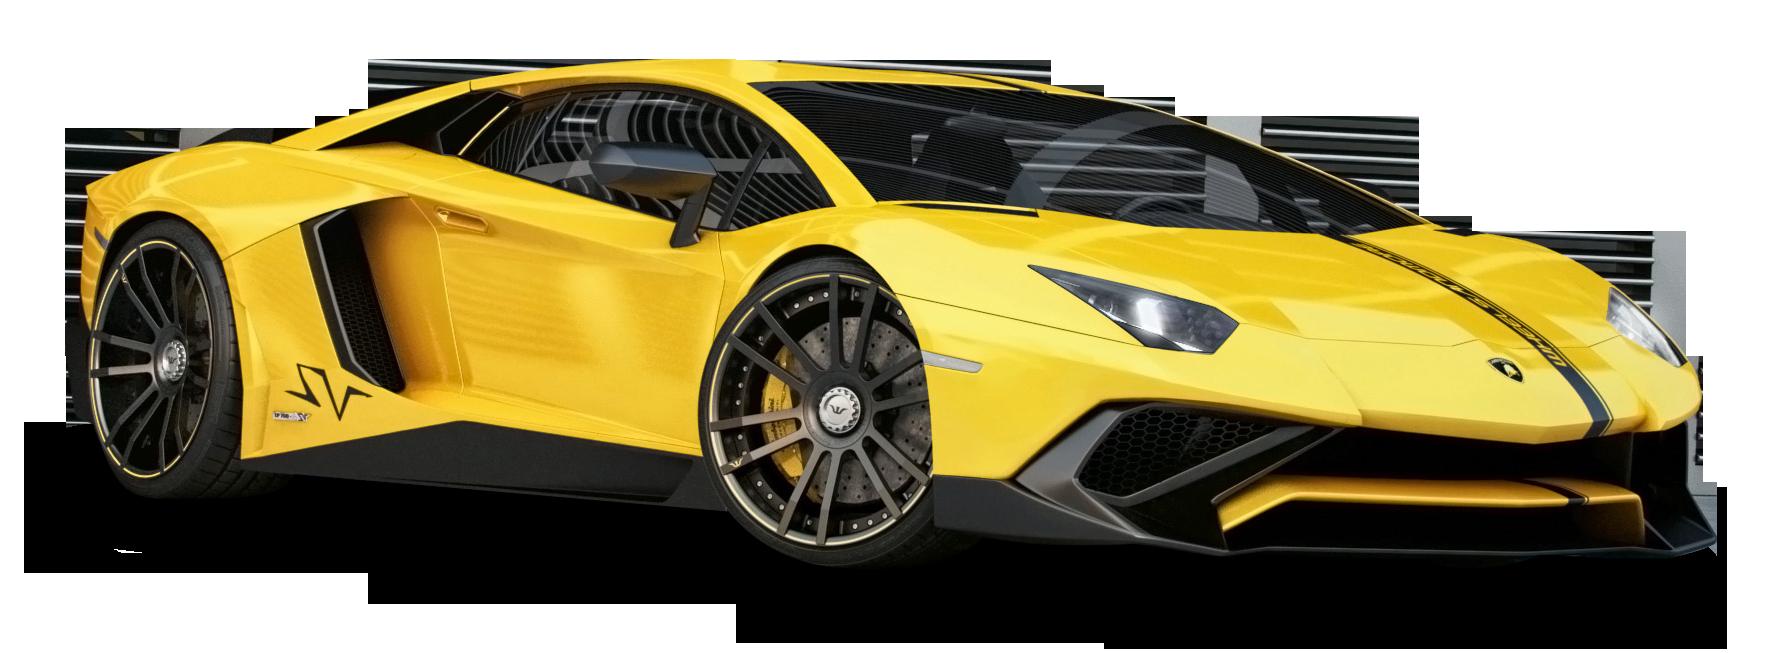 Lamborghini Png Transparent Lamborghini Png Images Pluspng